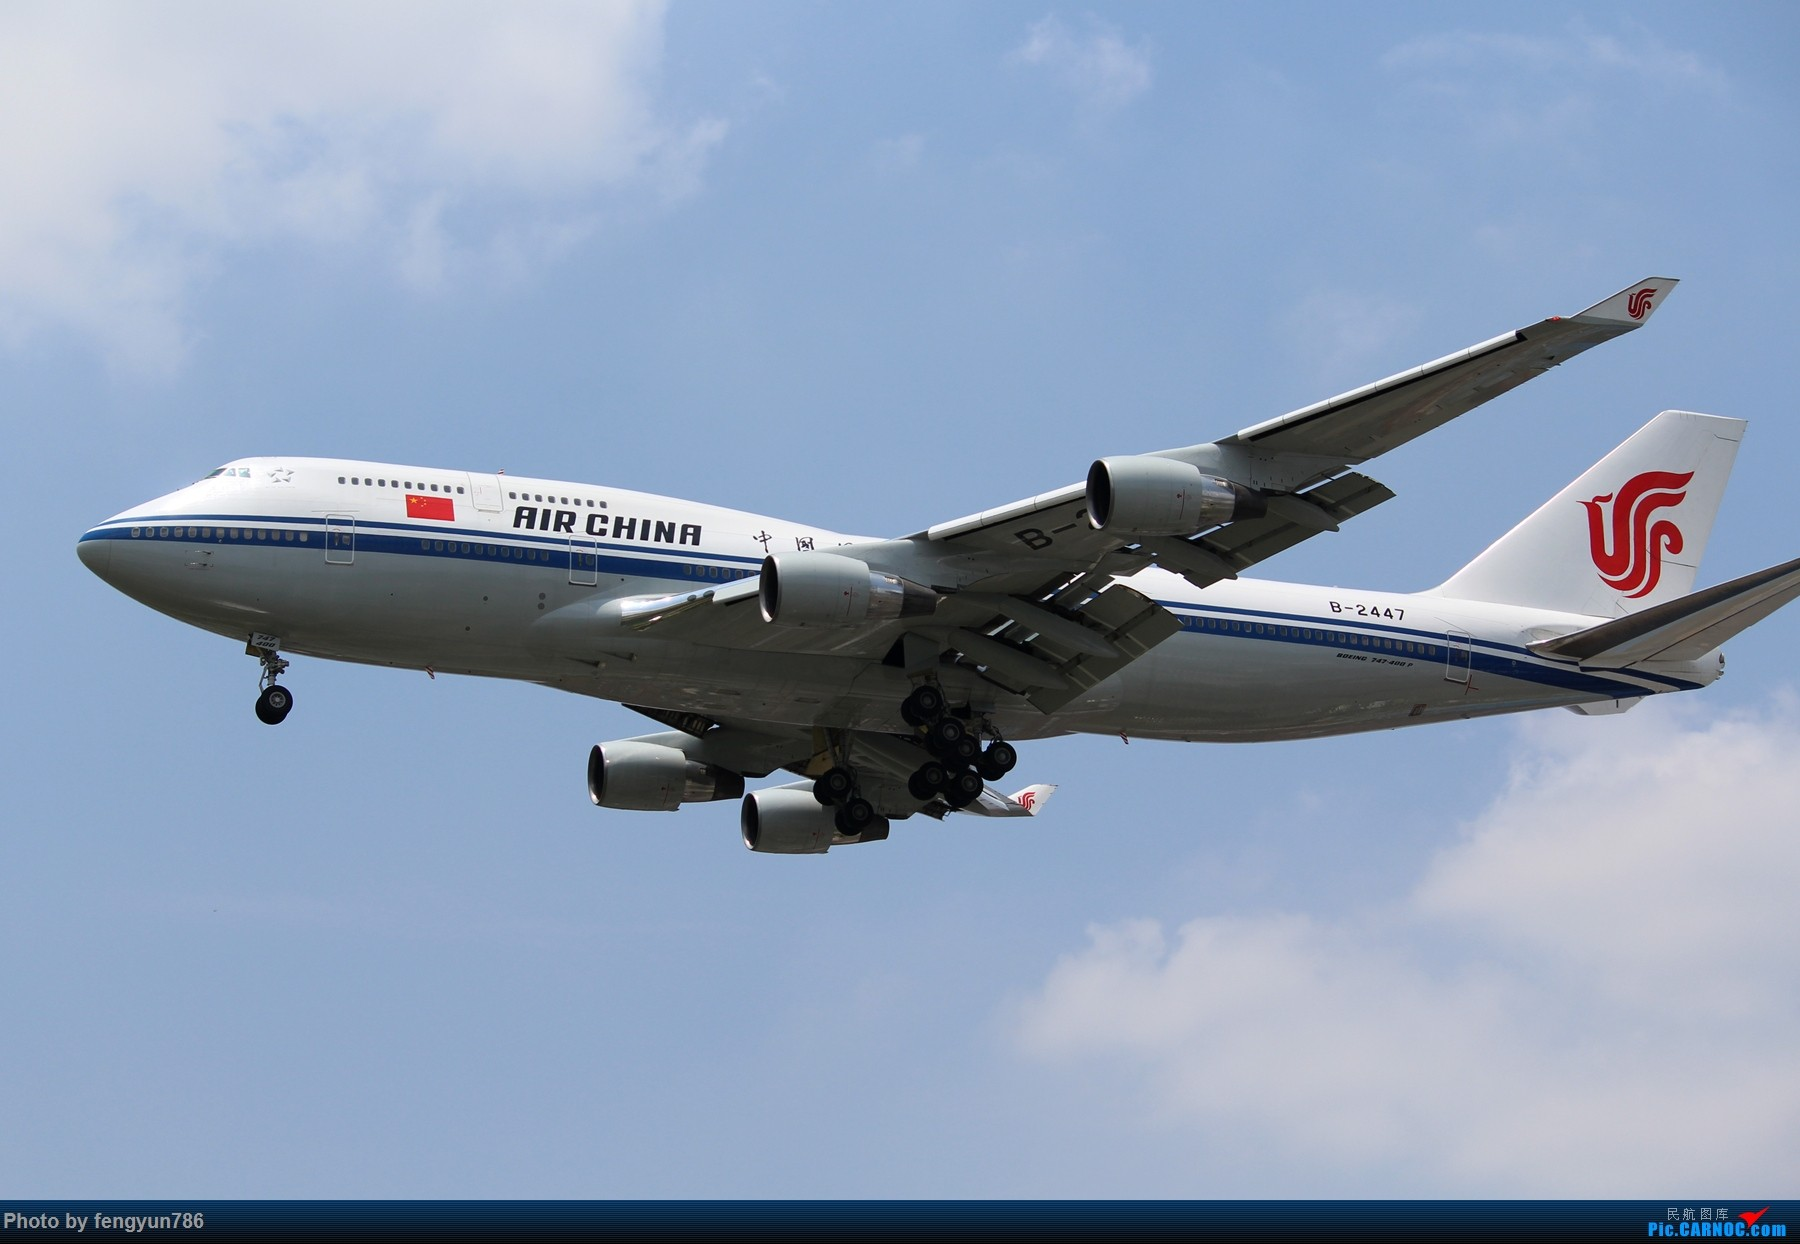 Re:[原创]7.19的SHA,天晴温高,发几个跟前一天不一样的。 BOEING 747-400 B-2447 中国上海虹桥国际机场